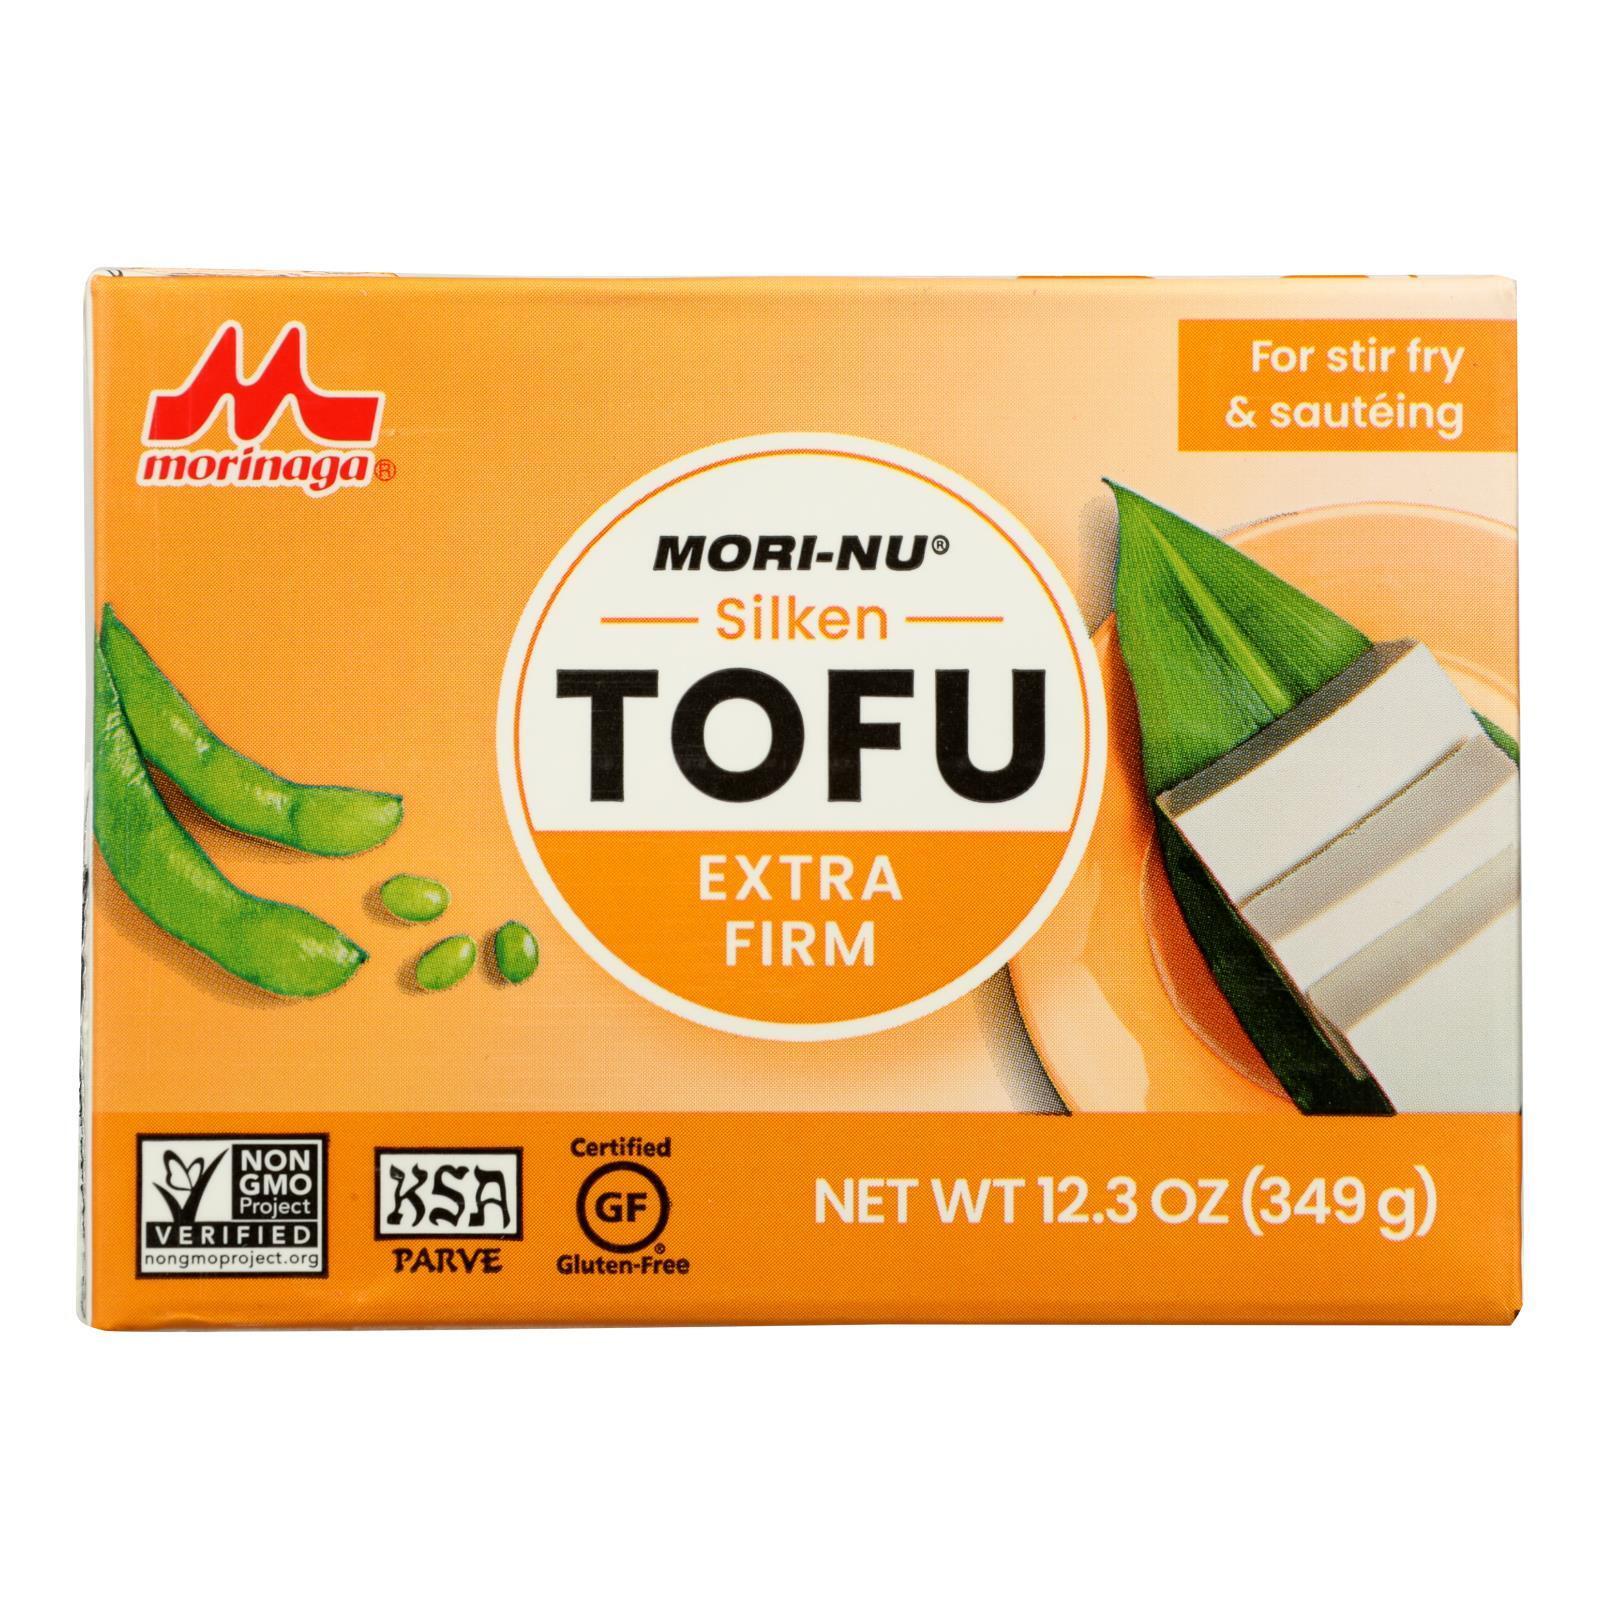 Mori-Nu Silken Tofu - Extra Firm - Case of 12 - 12.3 oz.